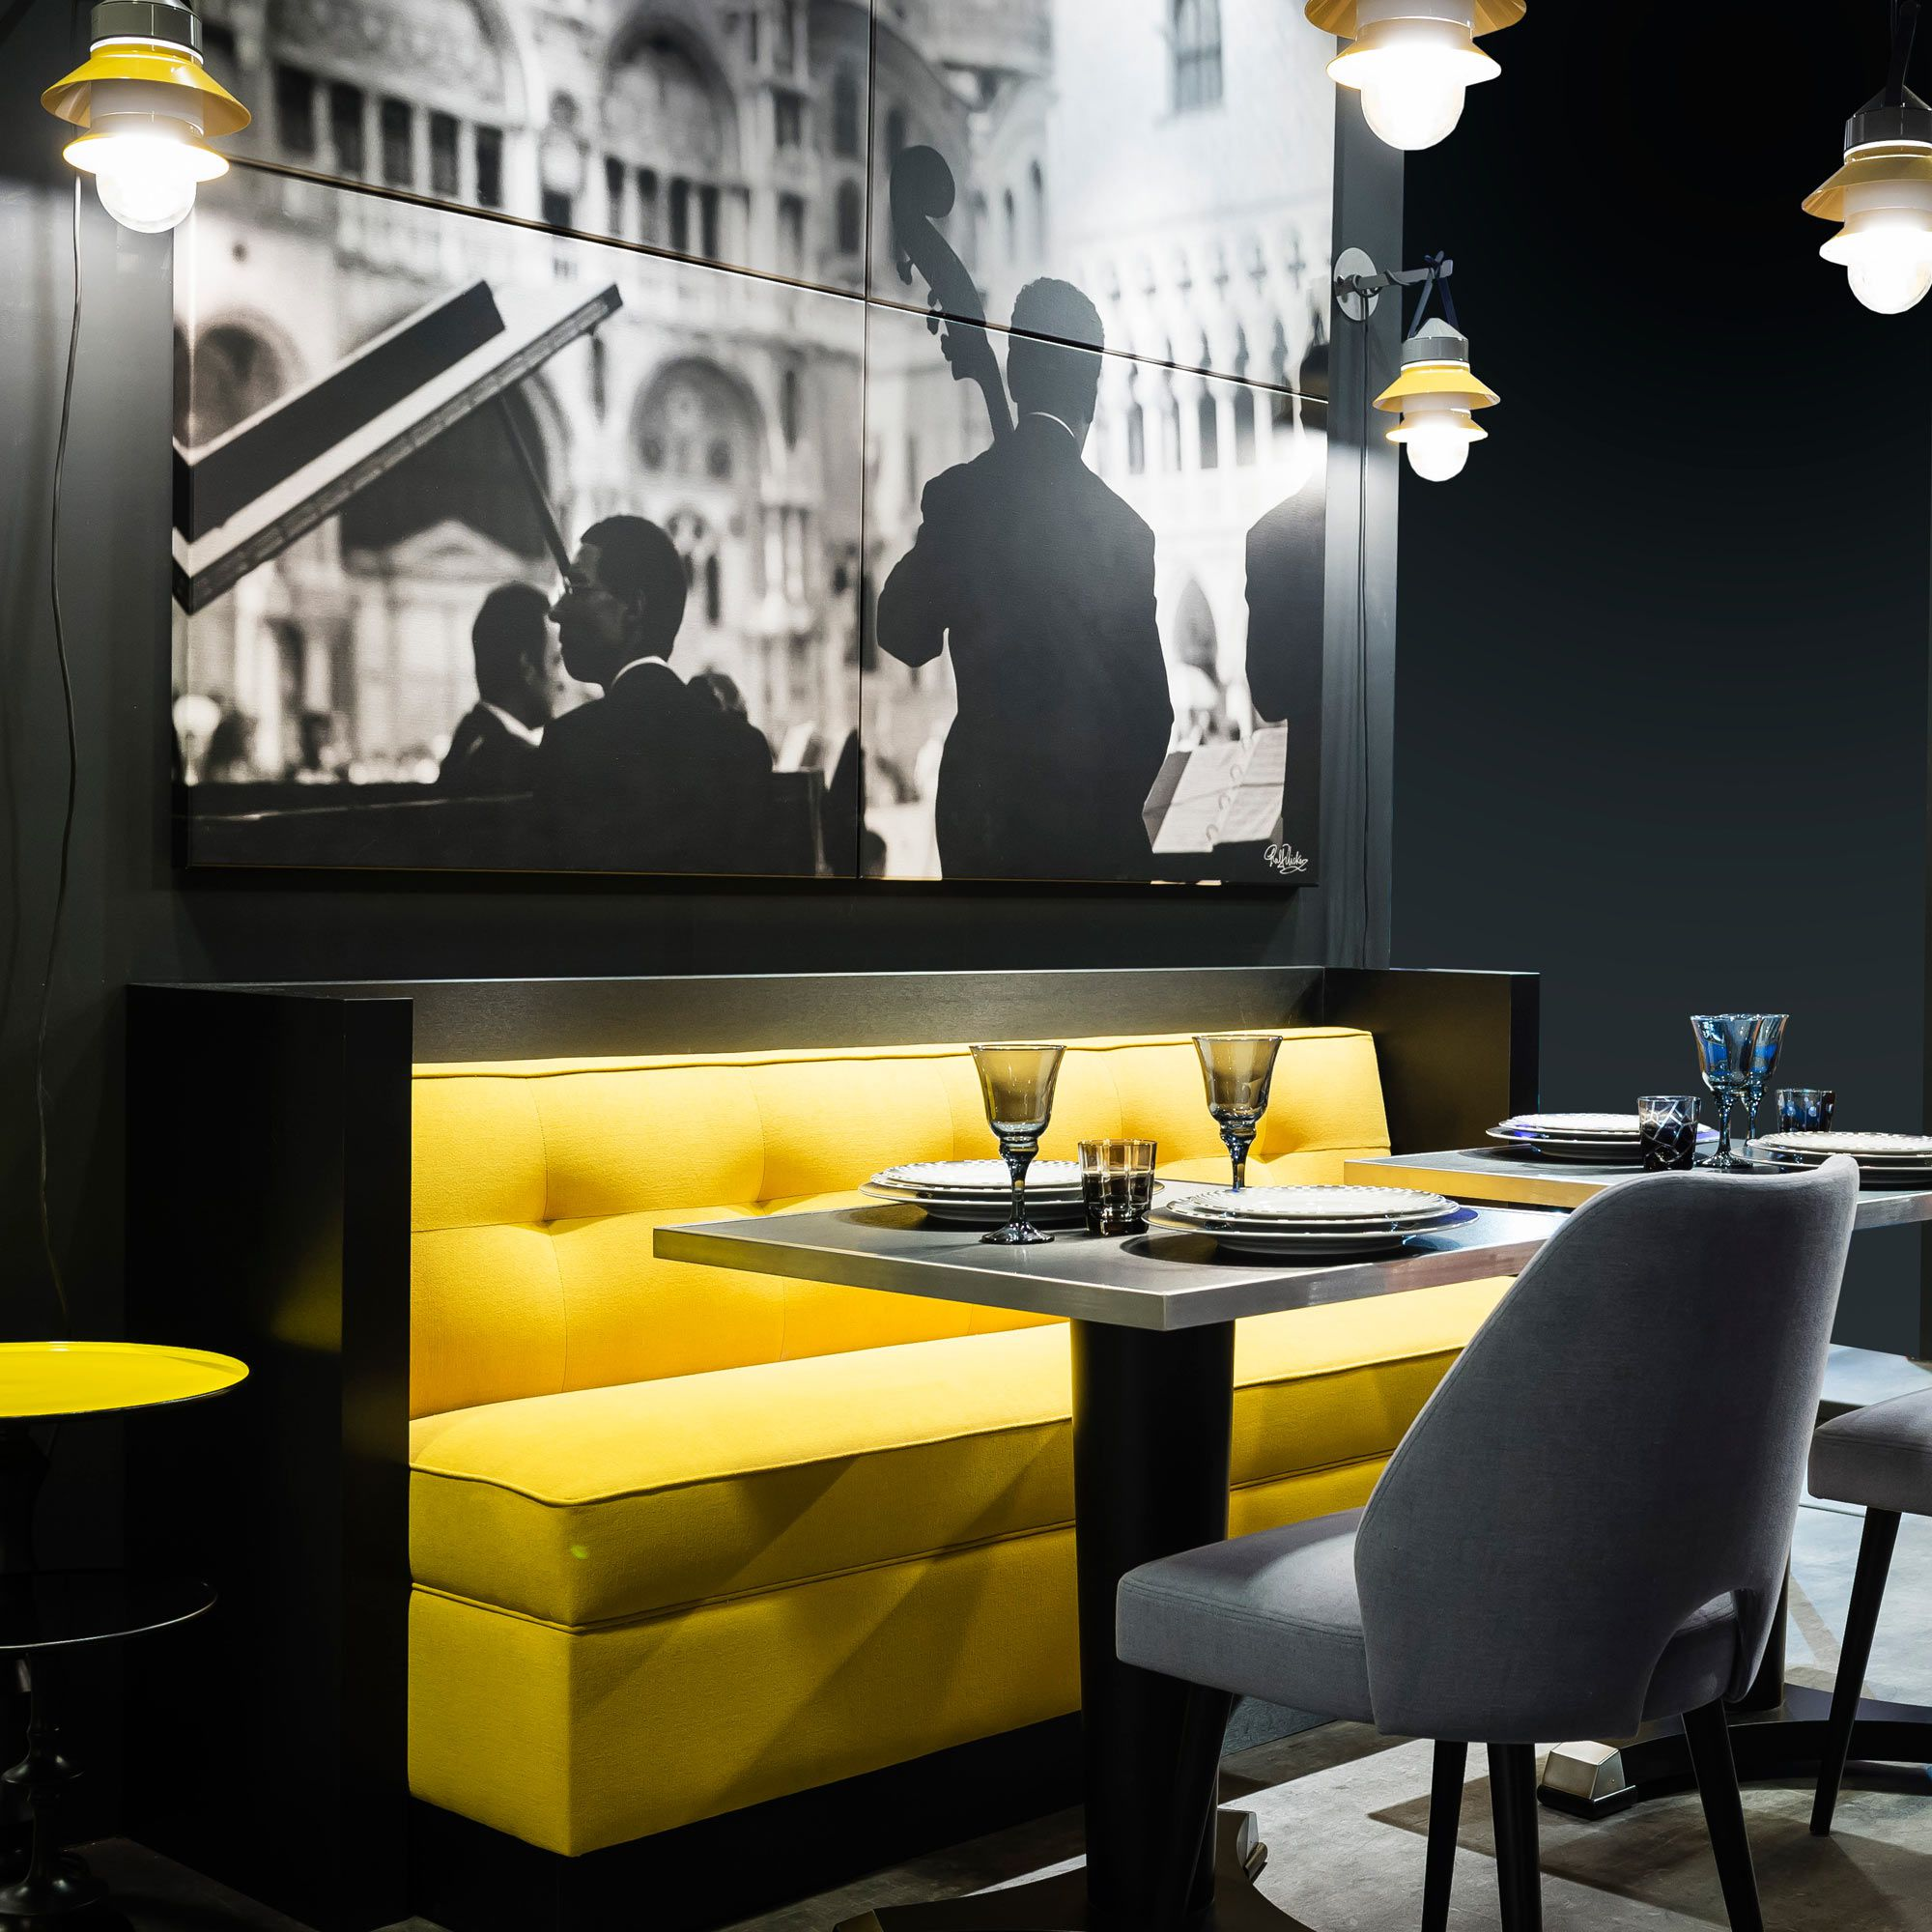 banquette jaune pour caf restaurant woodoo collinet. Black Bedroom Furniture Sets. Home Design Ideas